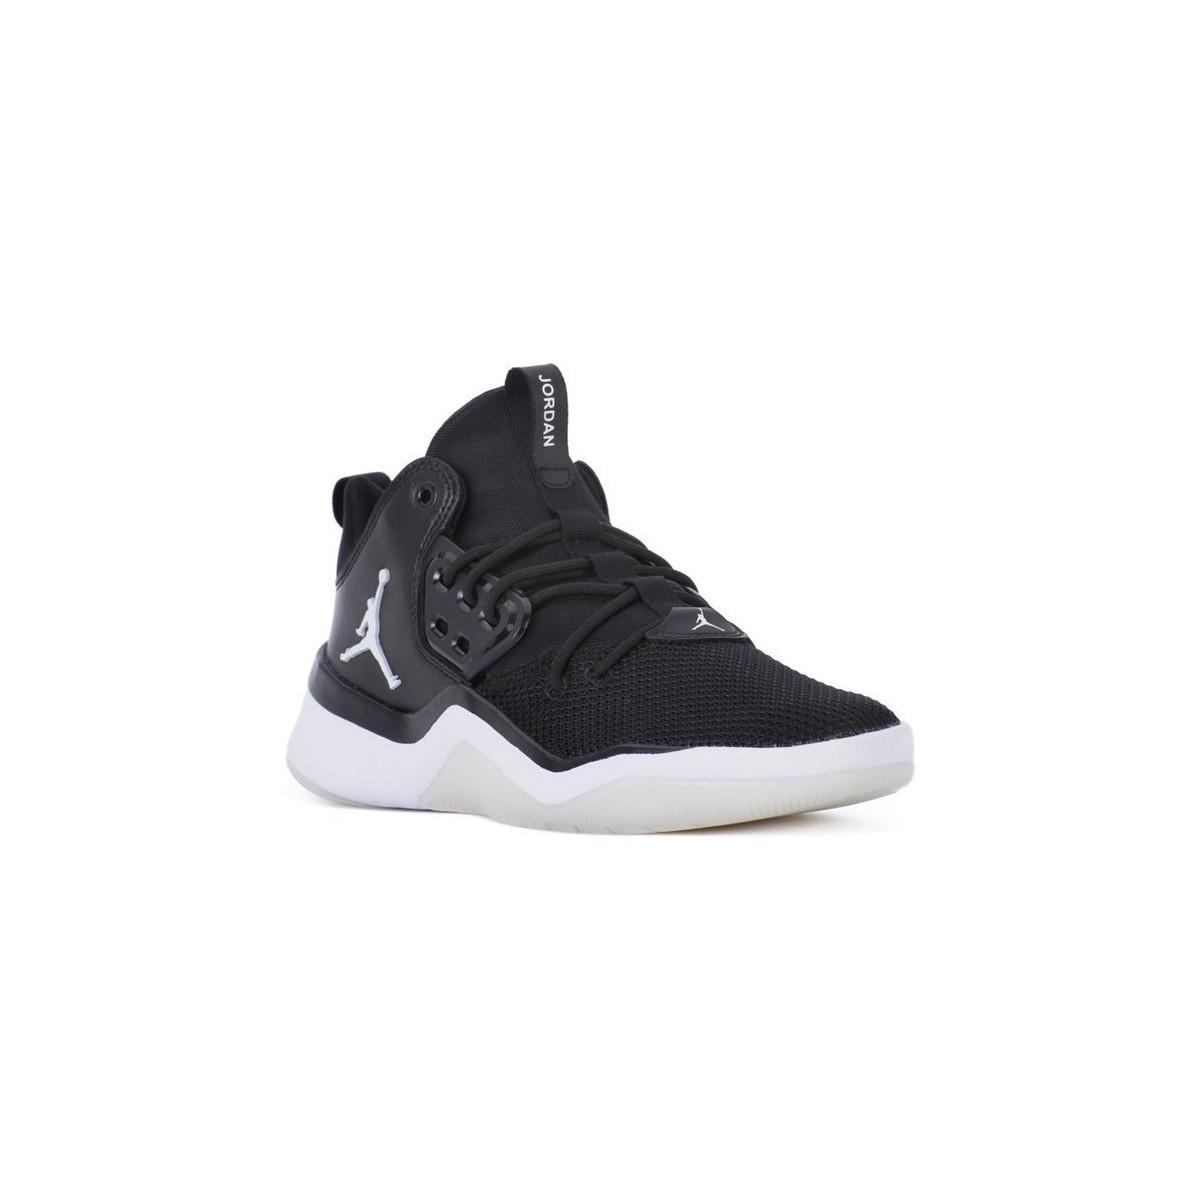 65ce9873f4a Nike Jordan Dna Men s Shoes (trainers) In Black in Black for Men - Lyst